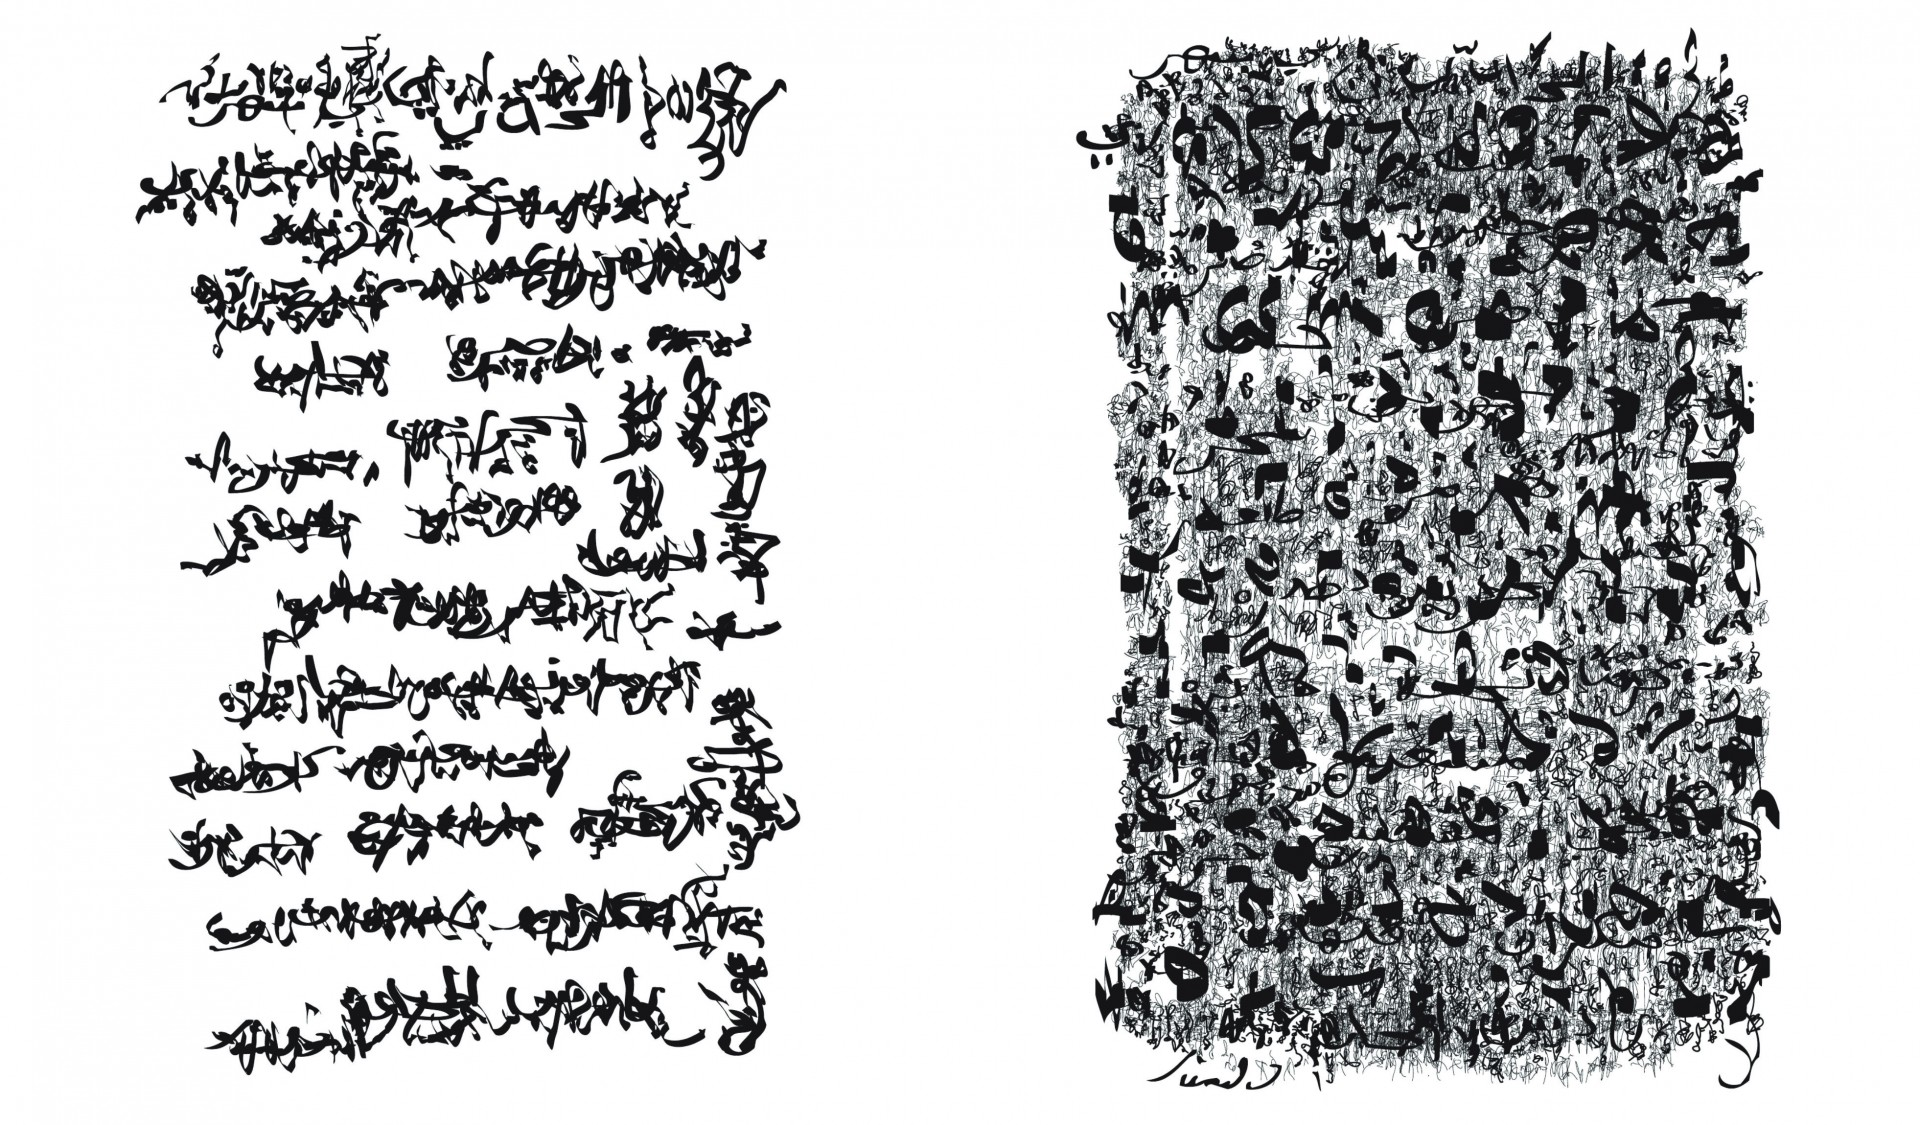 Palimpsest 001, und 002, Eco-Solvent Tinte auf LKW-Plane, je 137 x 205 cm, 2017